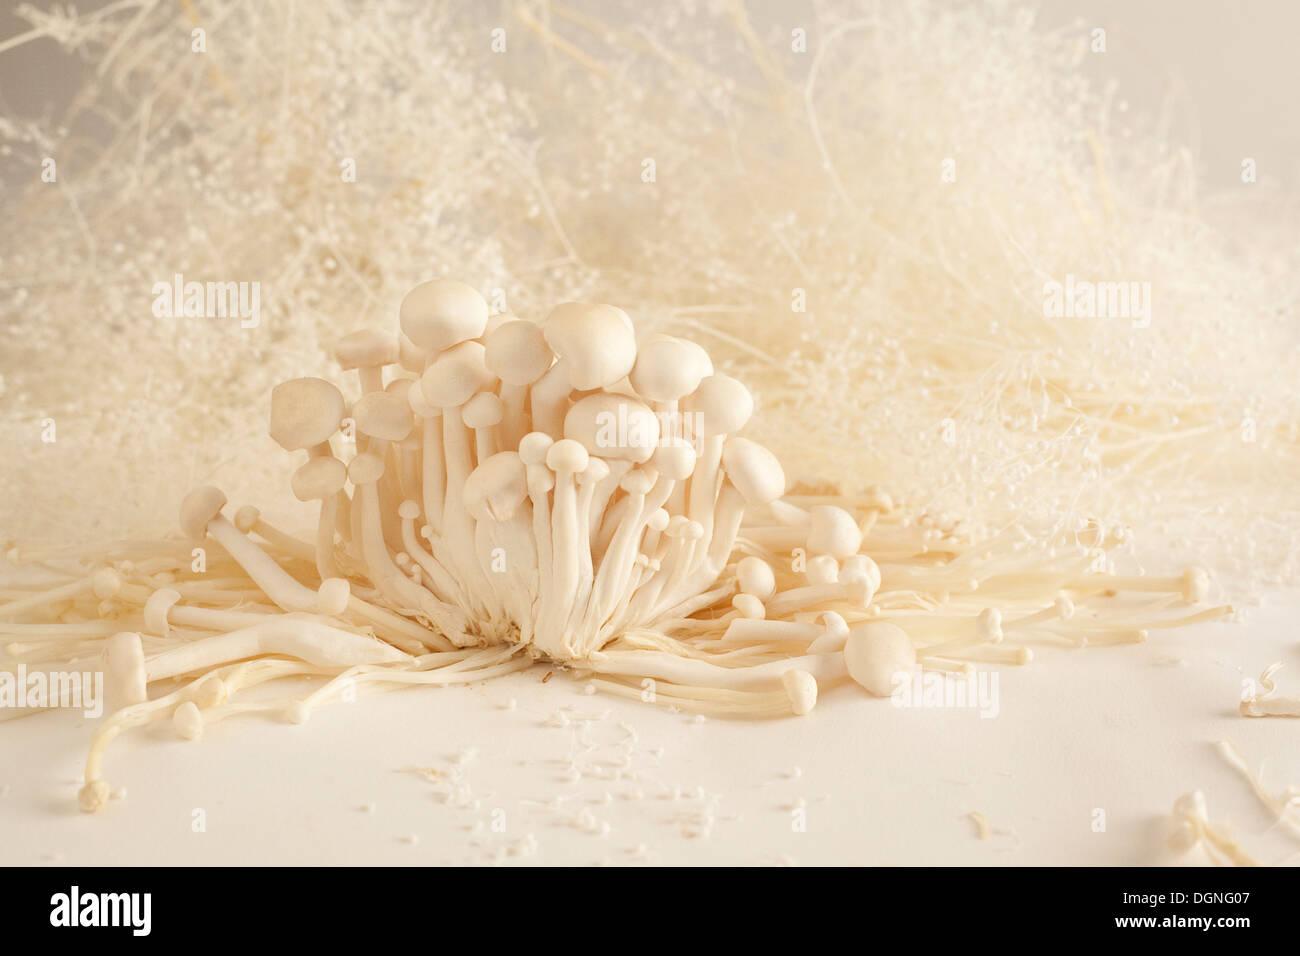 White beech mushrooms still life - Stock Image